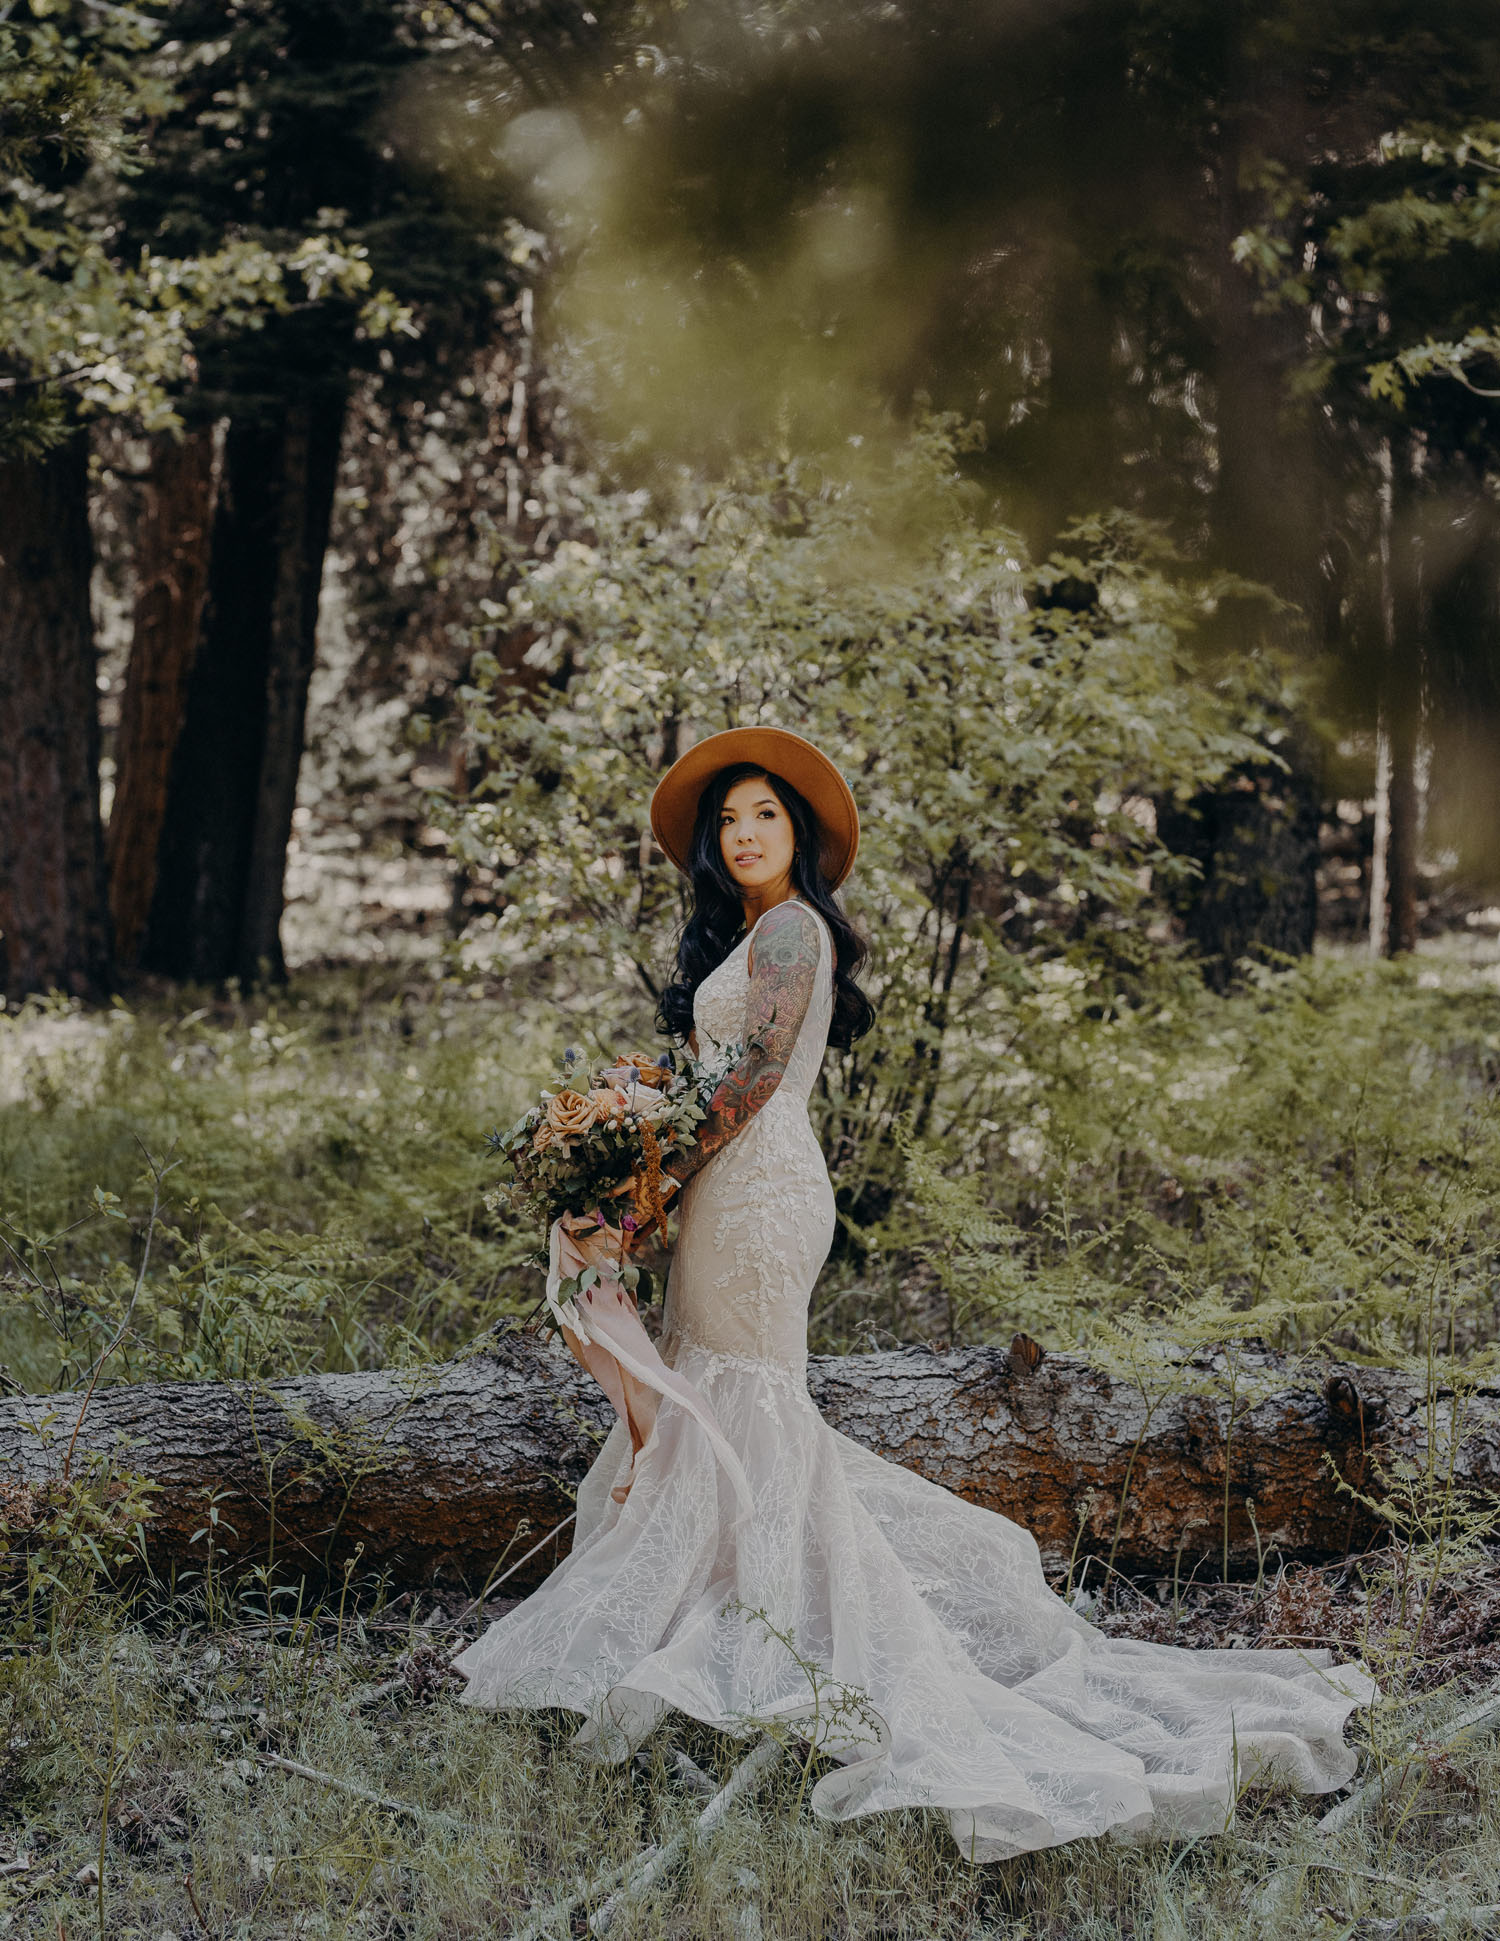 Boho Bride with Hat